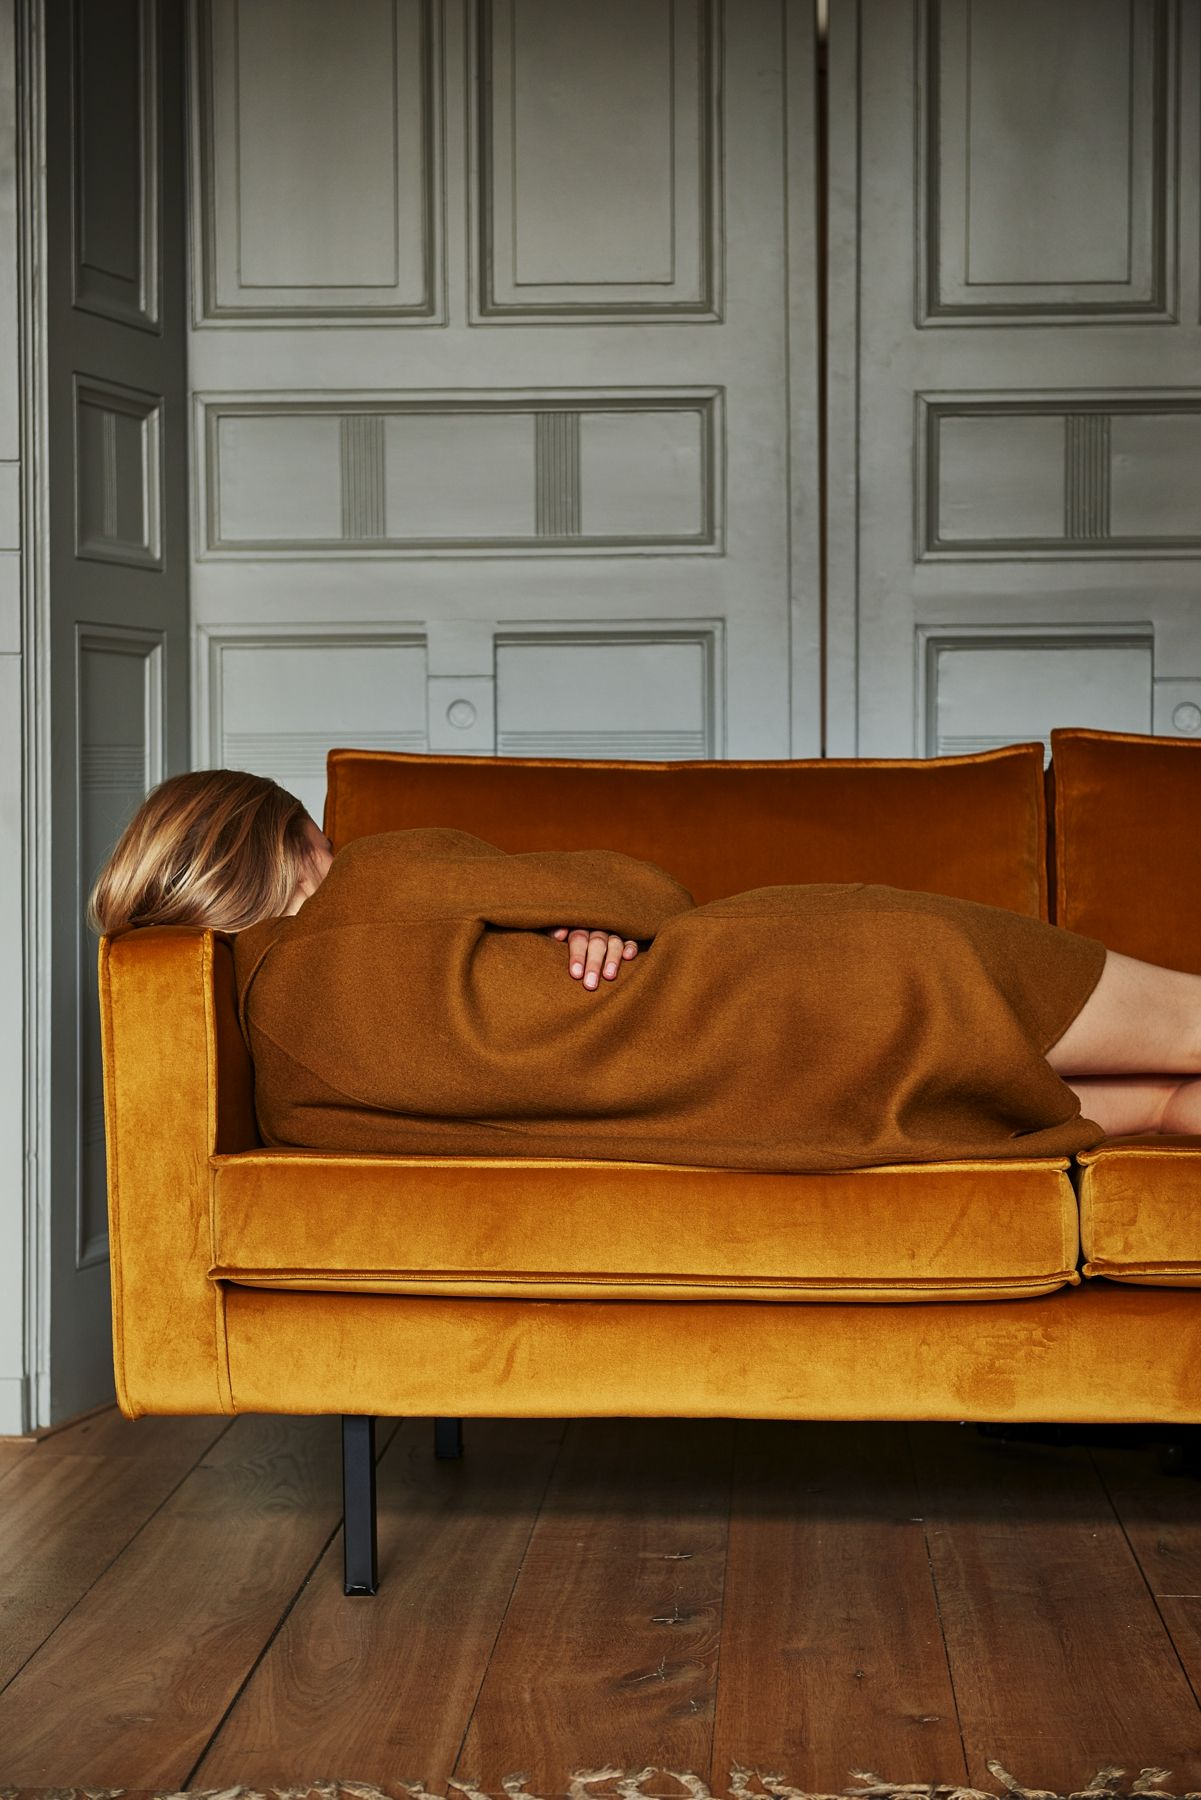 SISSY-BOY | FLOWING ELEGANCE | FW16 mustard yellow velvet sofa